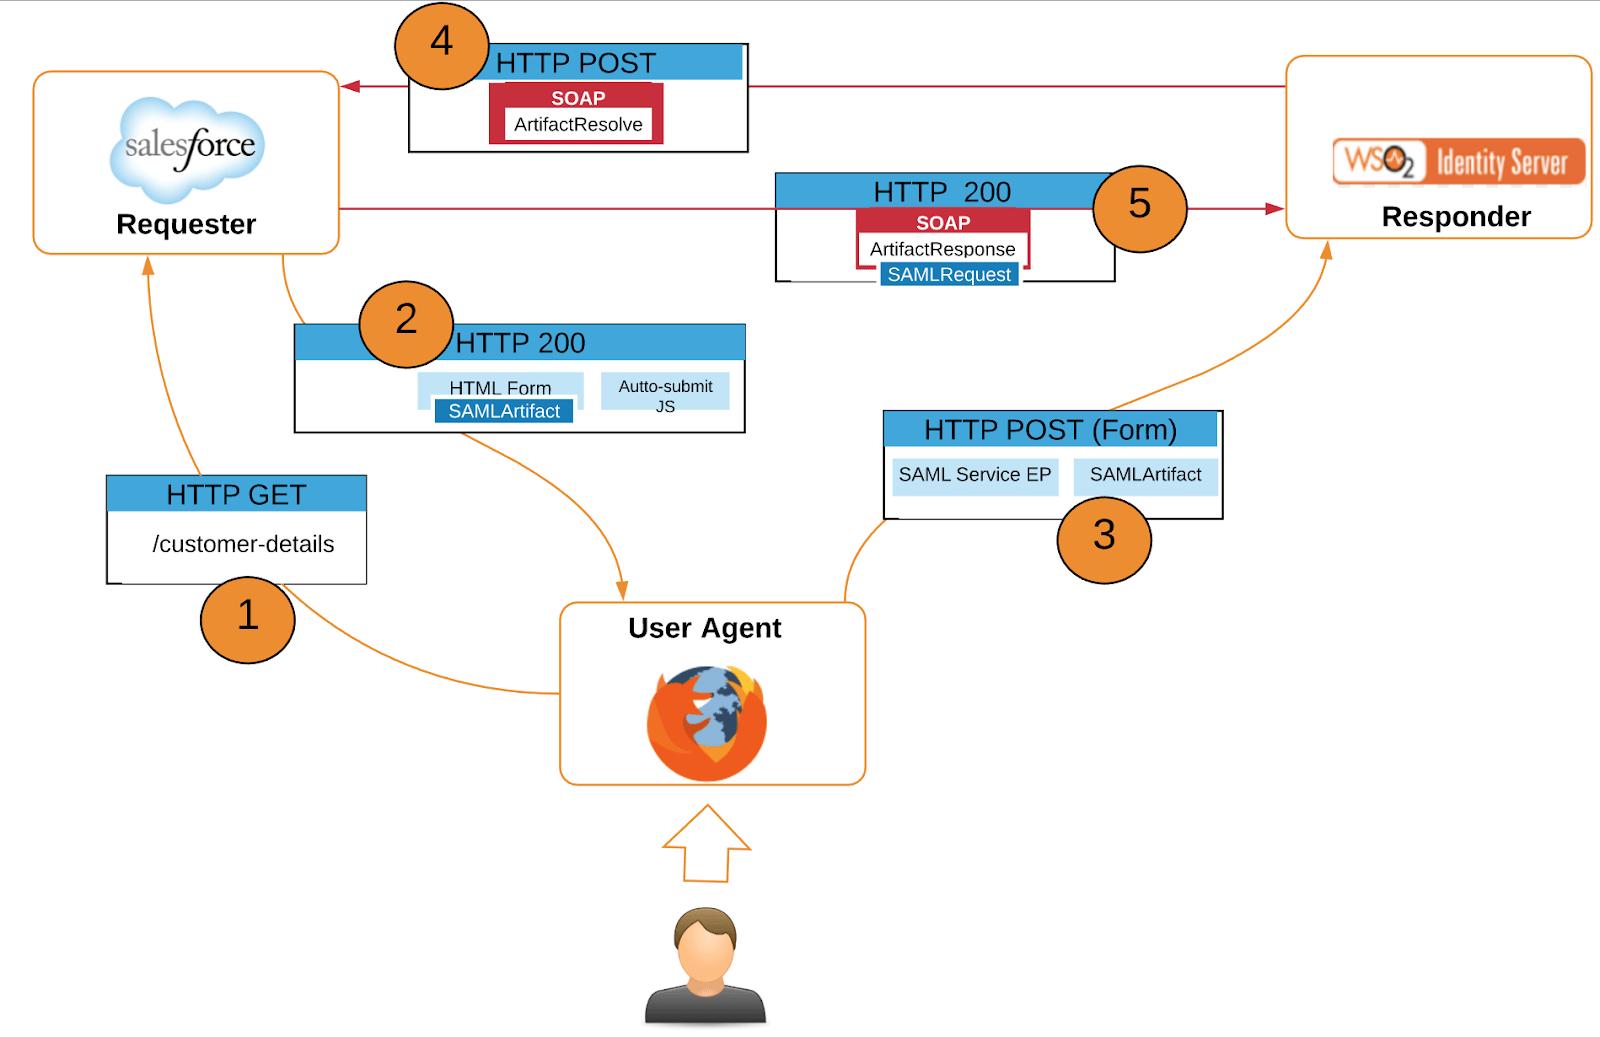 hight resolution of saml artifact binding based on http post